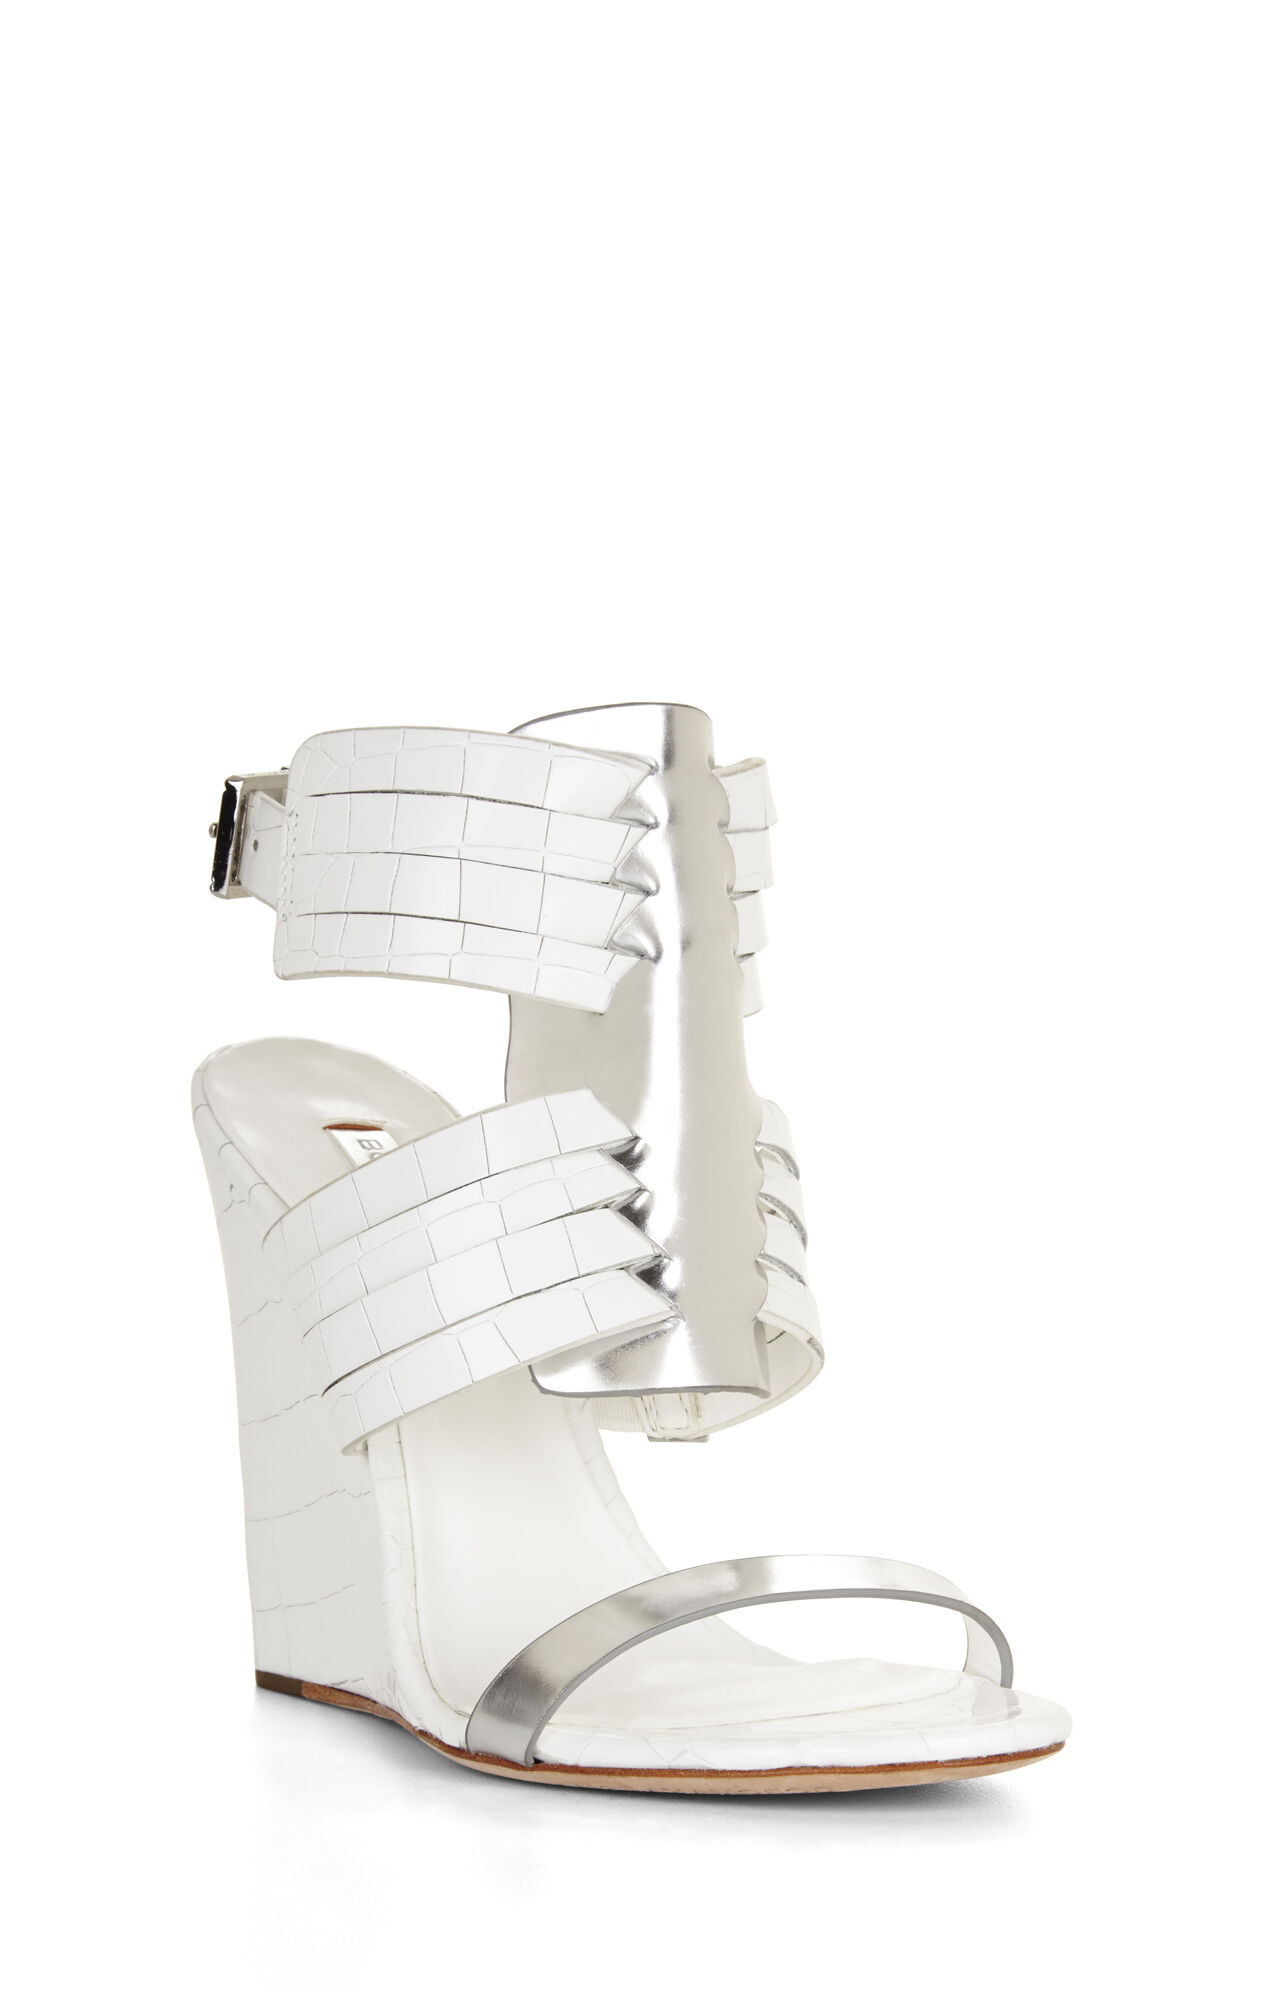 Liv Gladiator Wedge Sandal